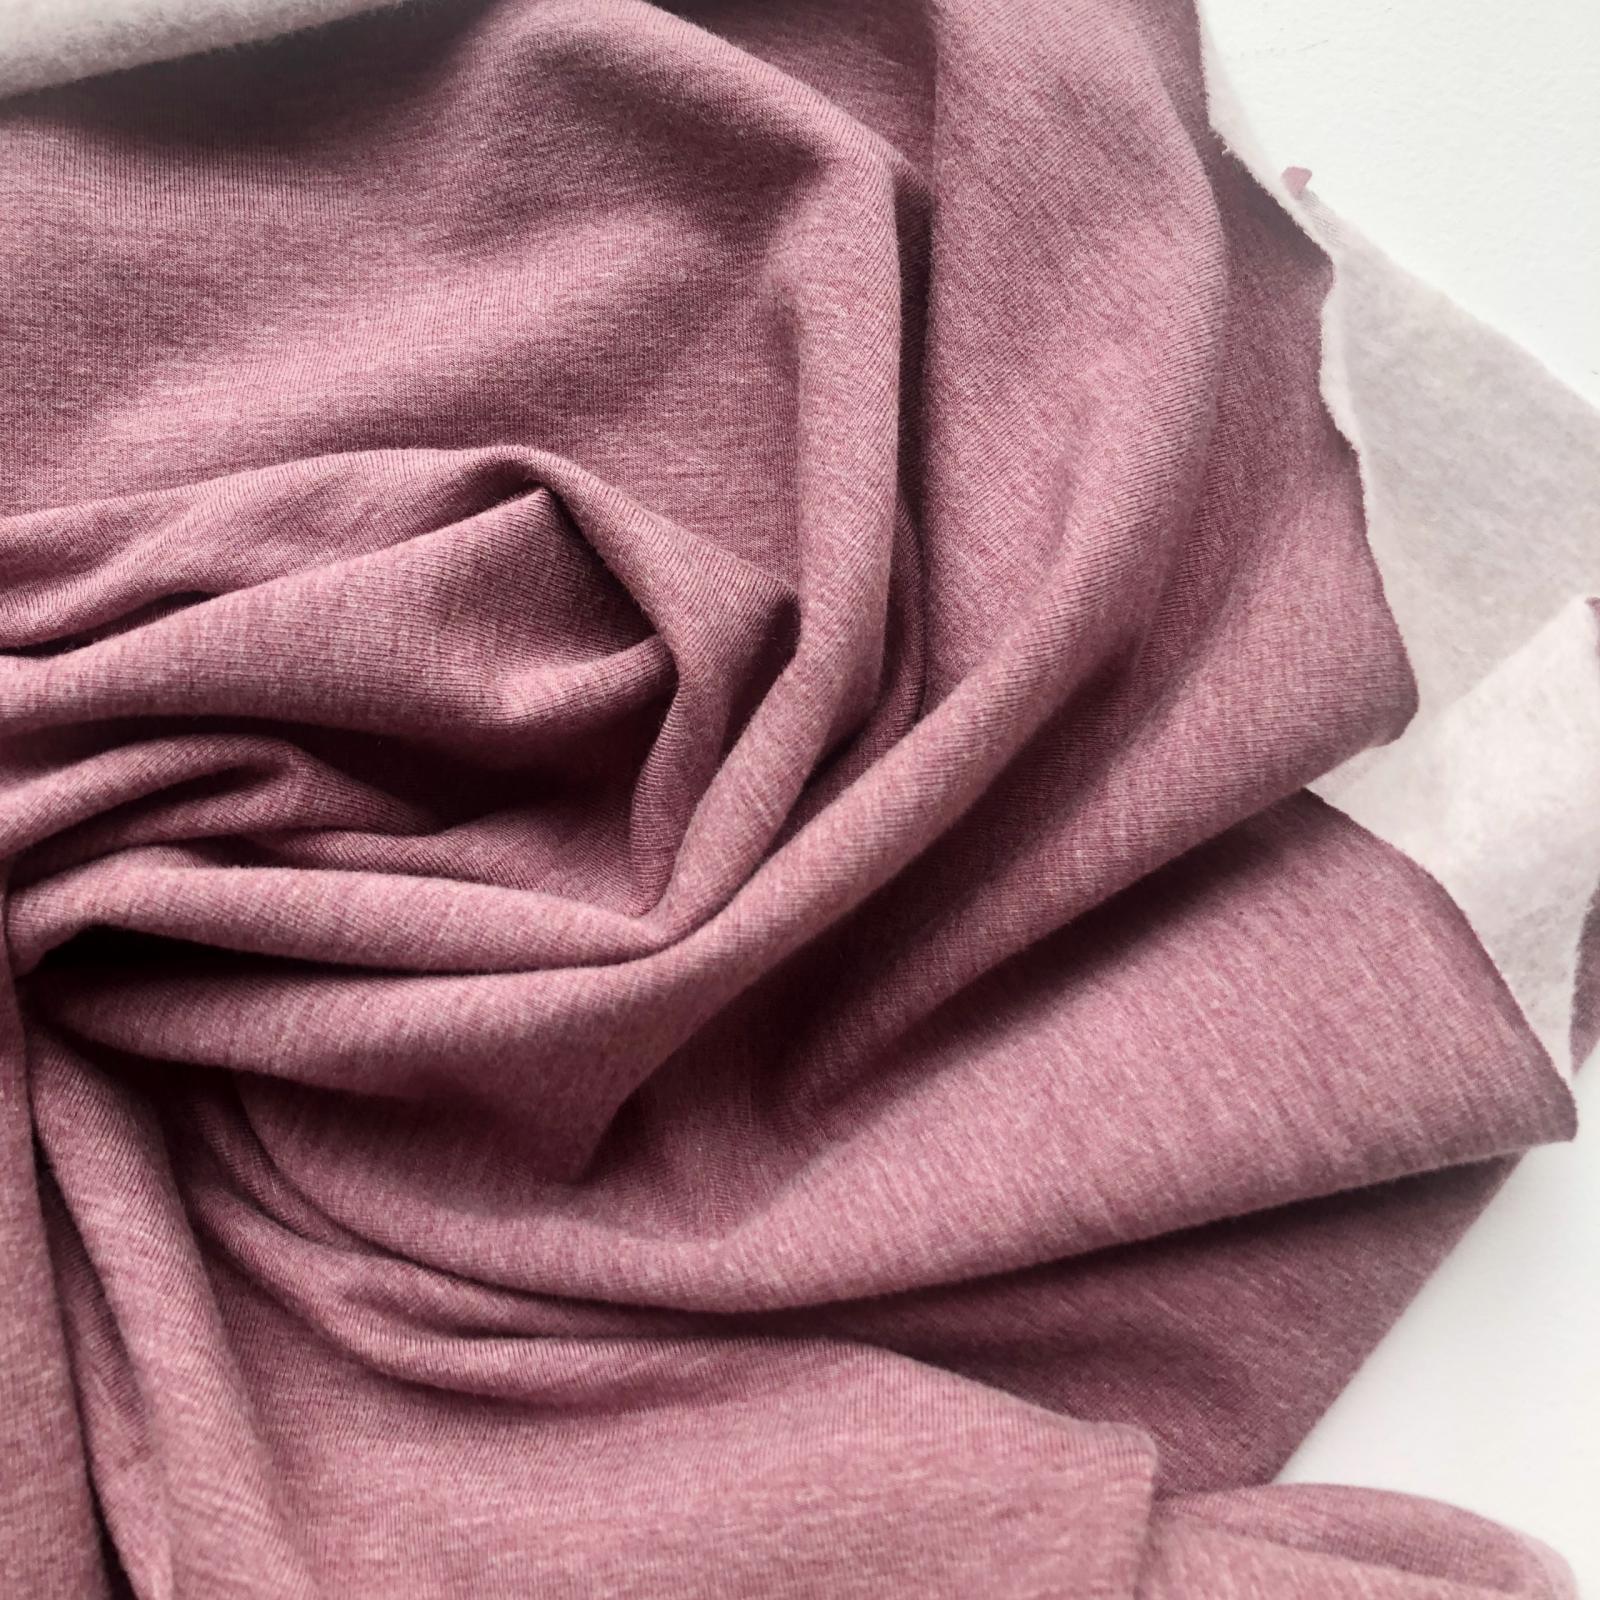 Oeko Tex Certified Bamboo Cotton Stretch Sweatshirt Fleece - Heather Rose Brown 60